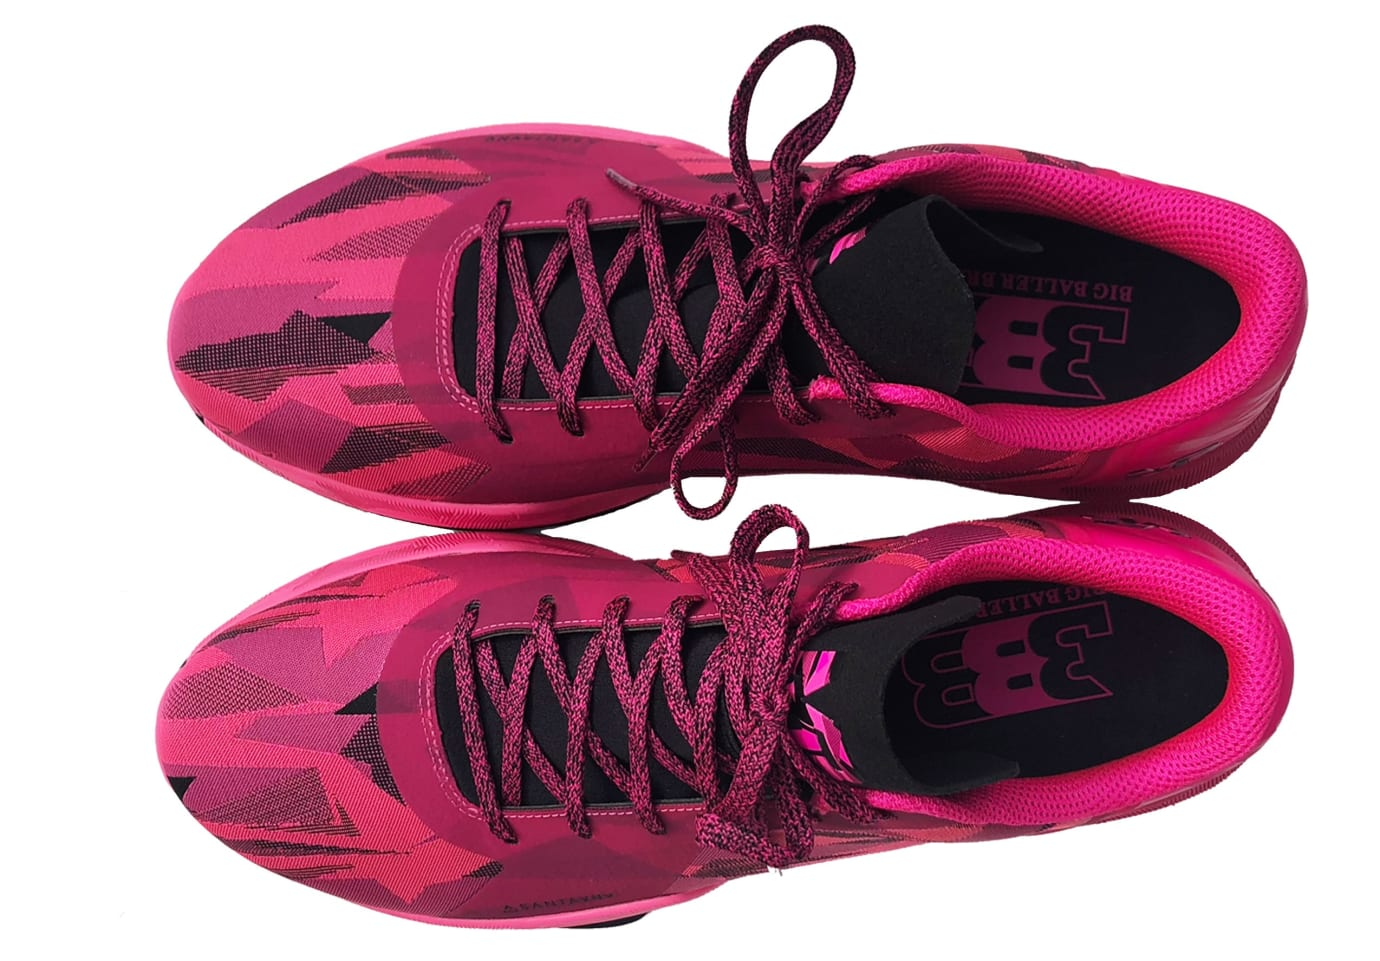 Big Baller Brand LaMelo Ball 1 Breast Cancer Awareness Top